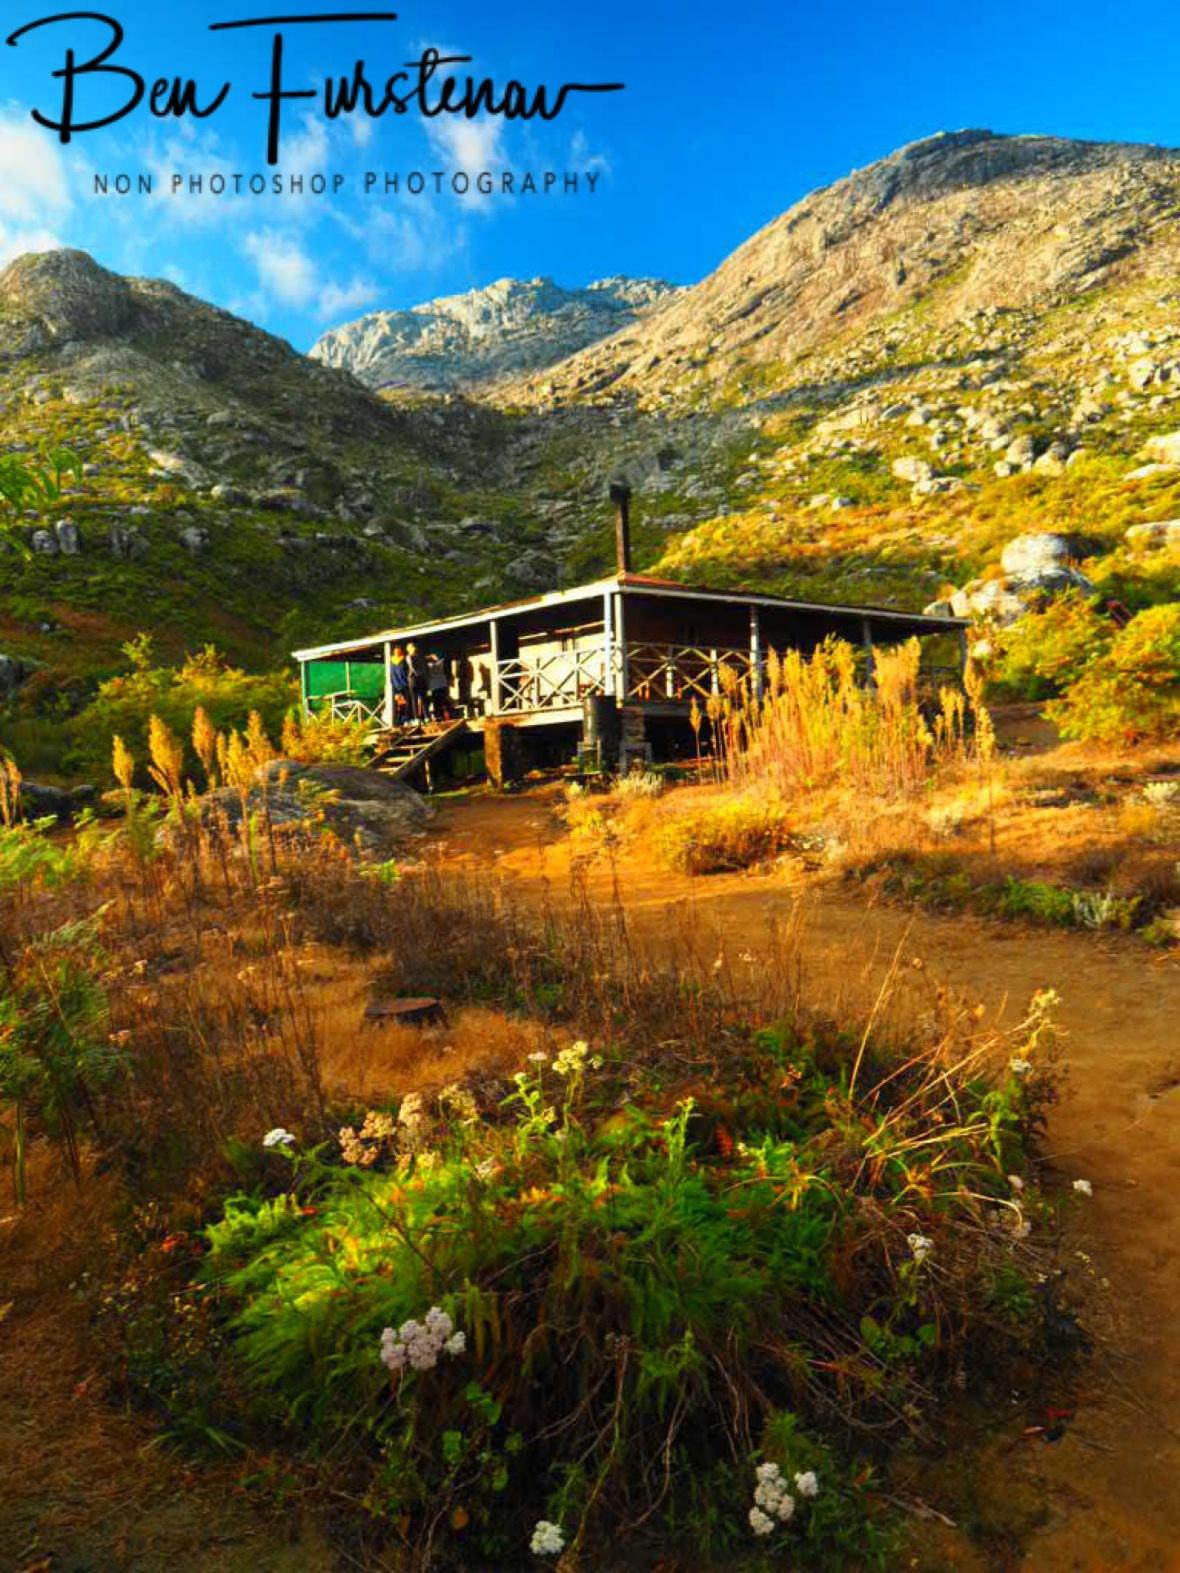 Chisepo Hut with Mountain backdrop, Mulanje Mountains, Malawi